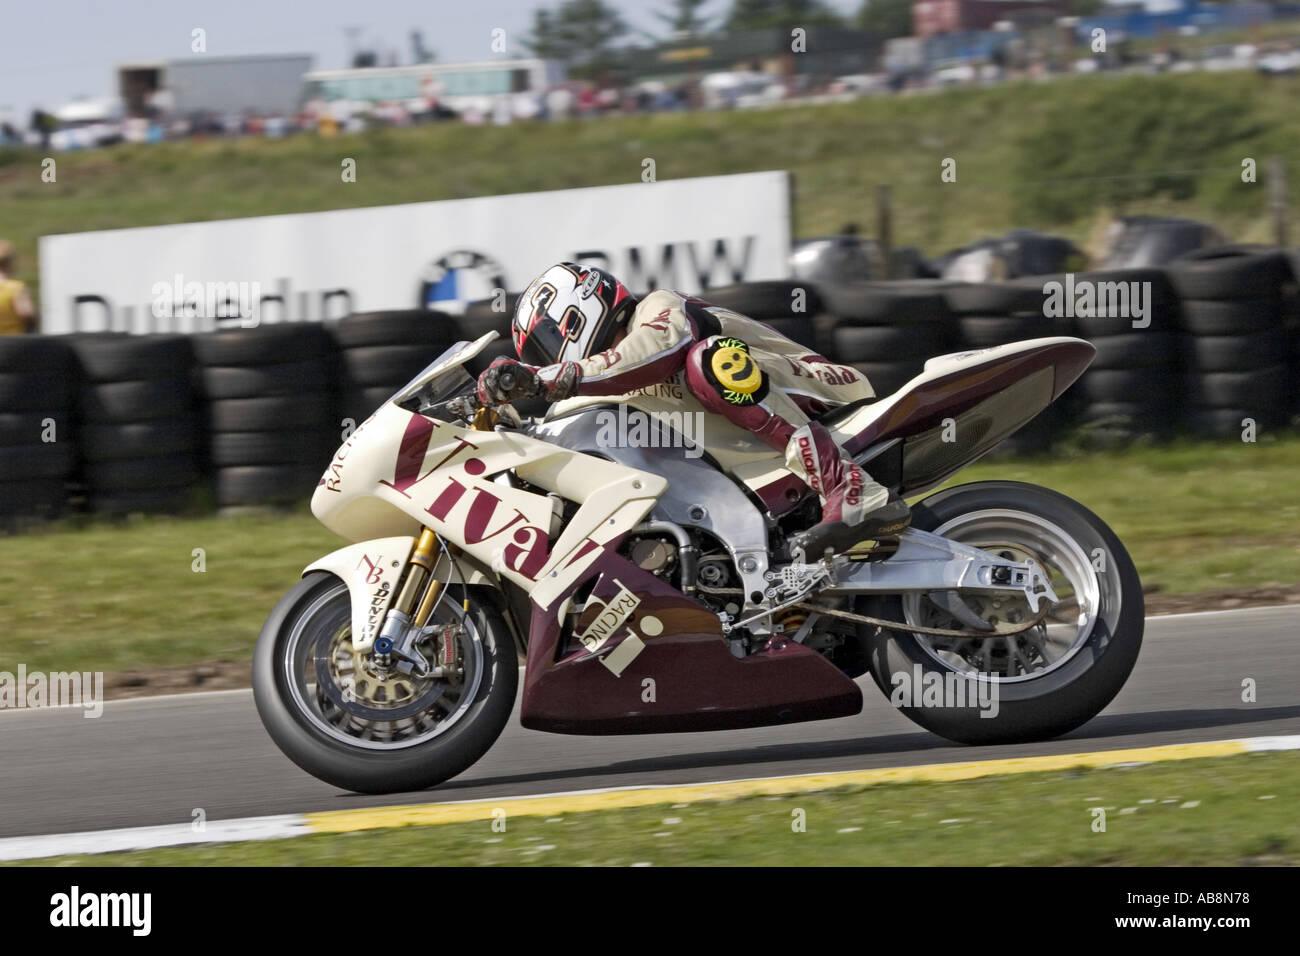 Tristan Palmer riding for Vivaldi Racing team at the Scottish round of the British Superbike Championship 2005 - Stock Image